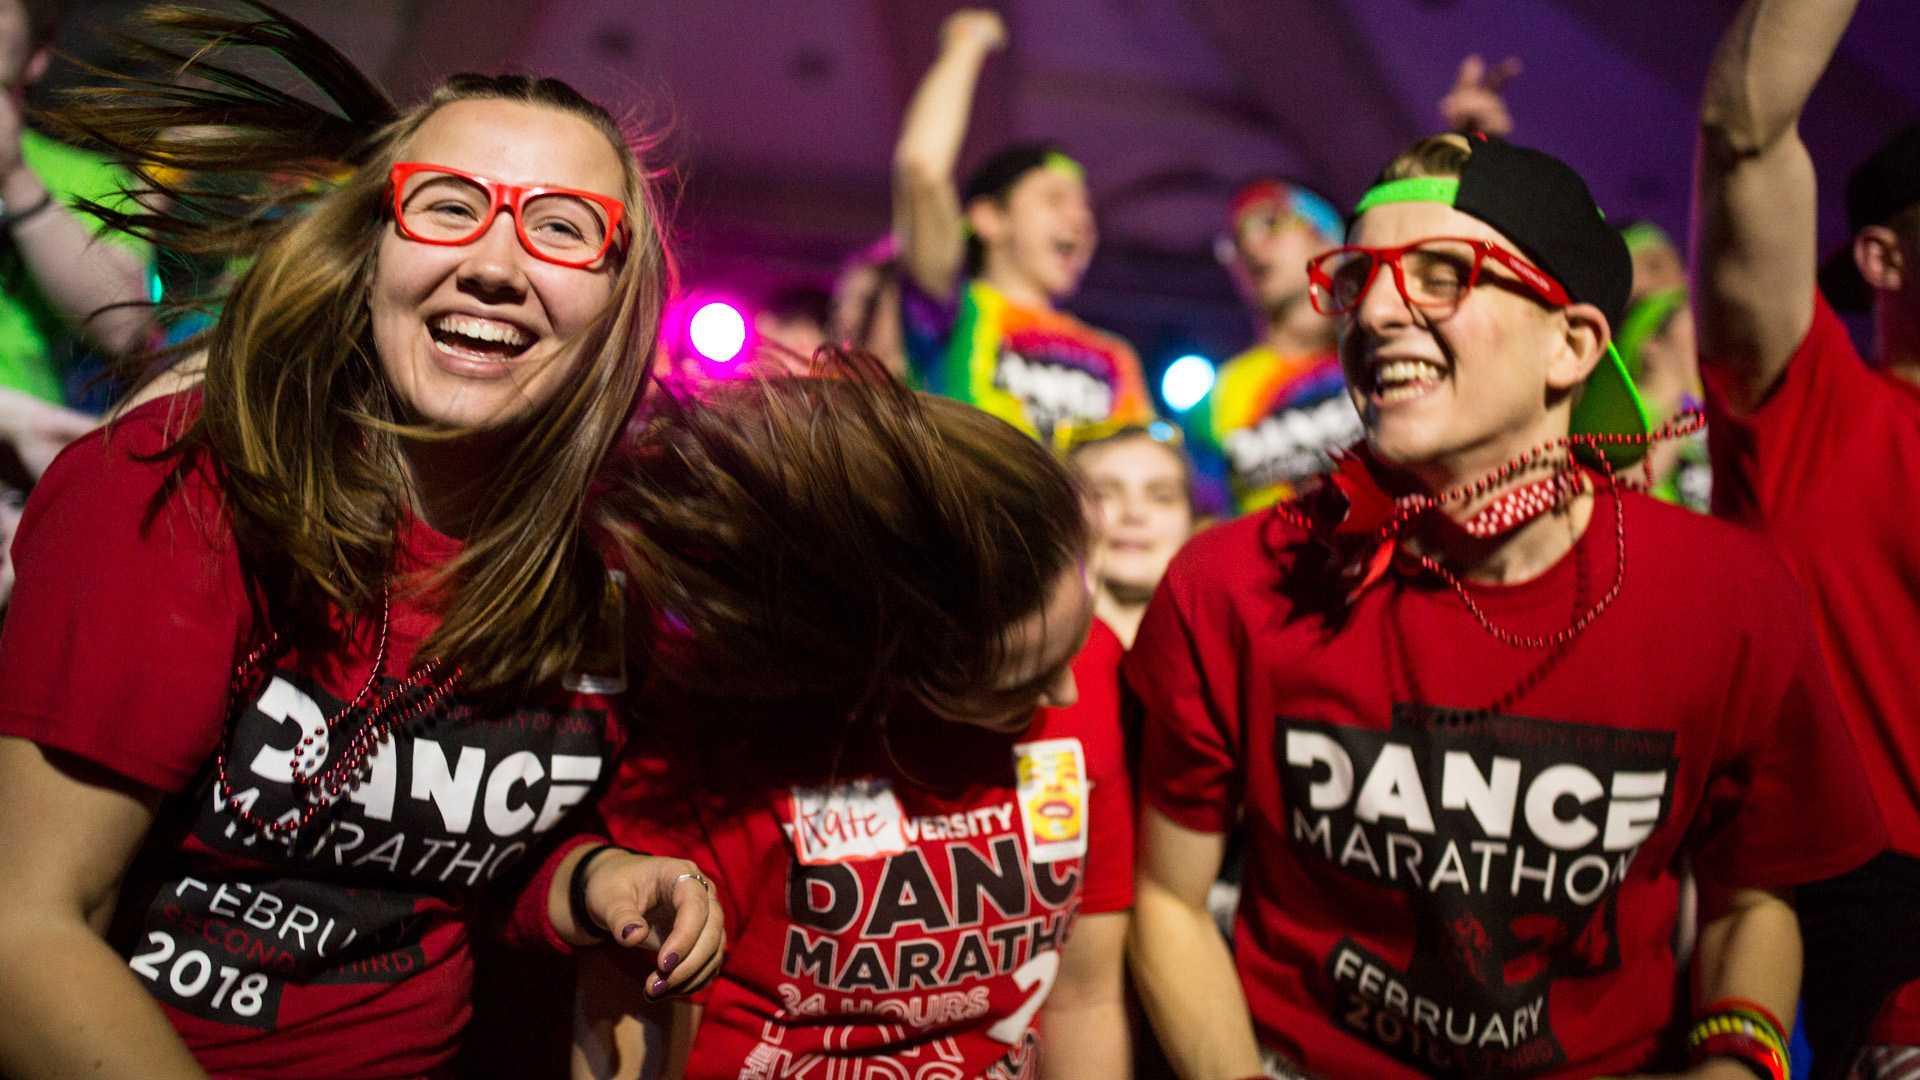 Dance marathon participants dance on stage during the ninth hour of the University of Iowa 24th Annual Dance Marathon, on Saturday, Feb. 3, 2018. (David Harmantas/The Daily Iowan)